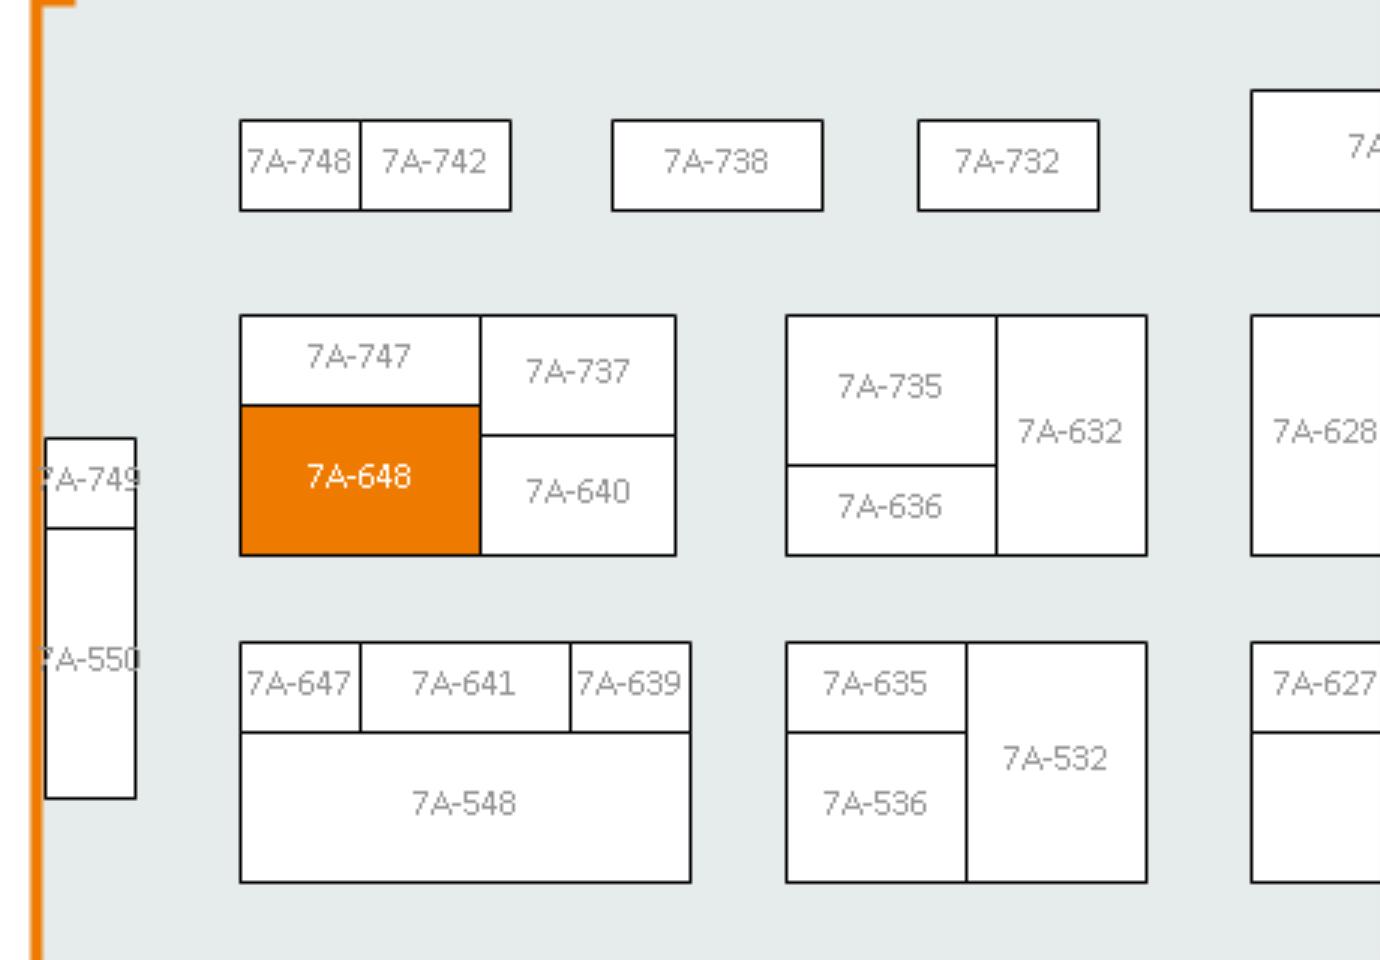 7A / 7A-648